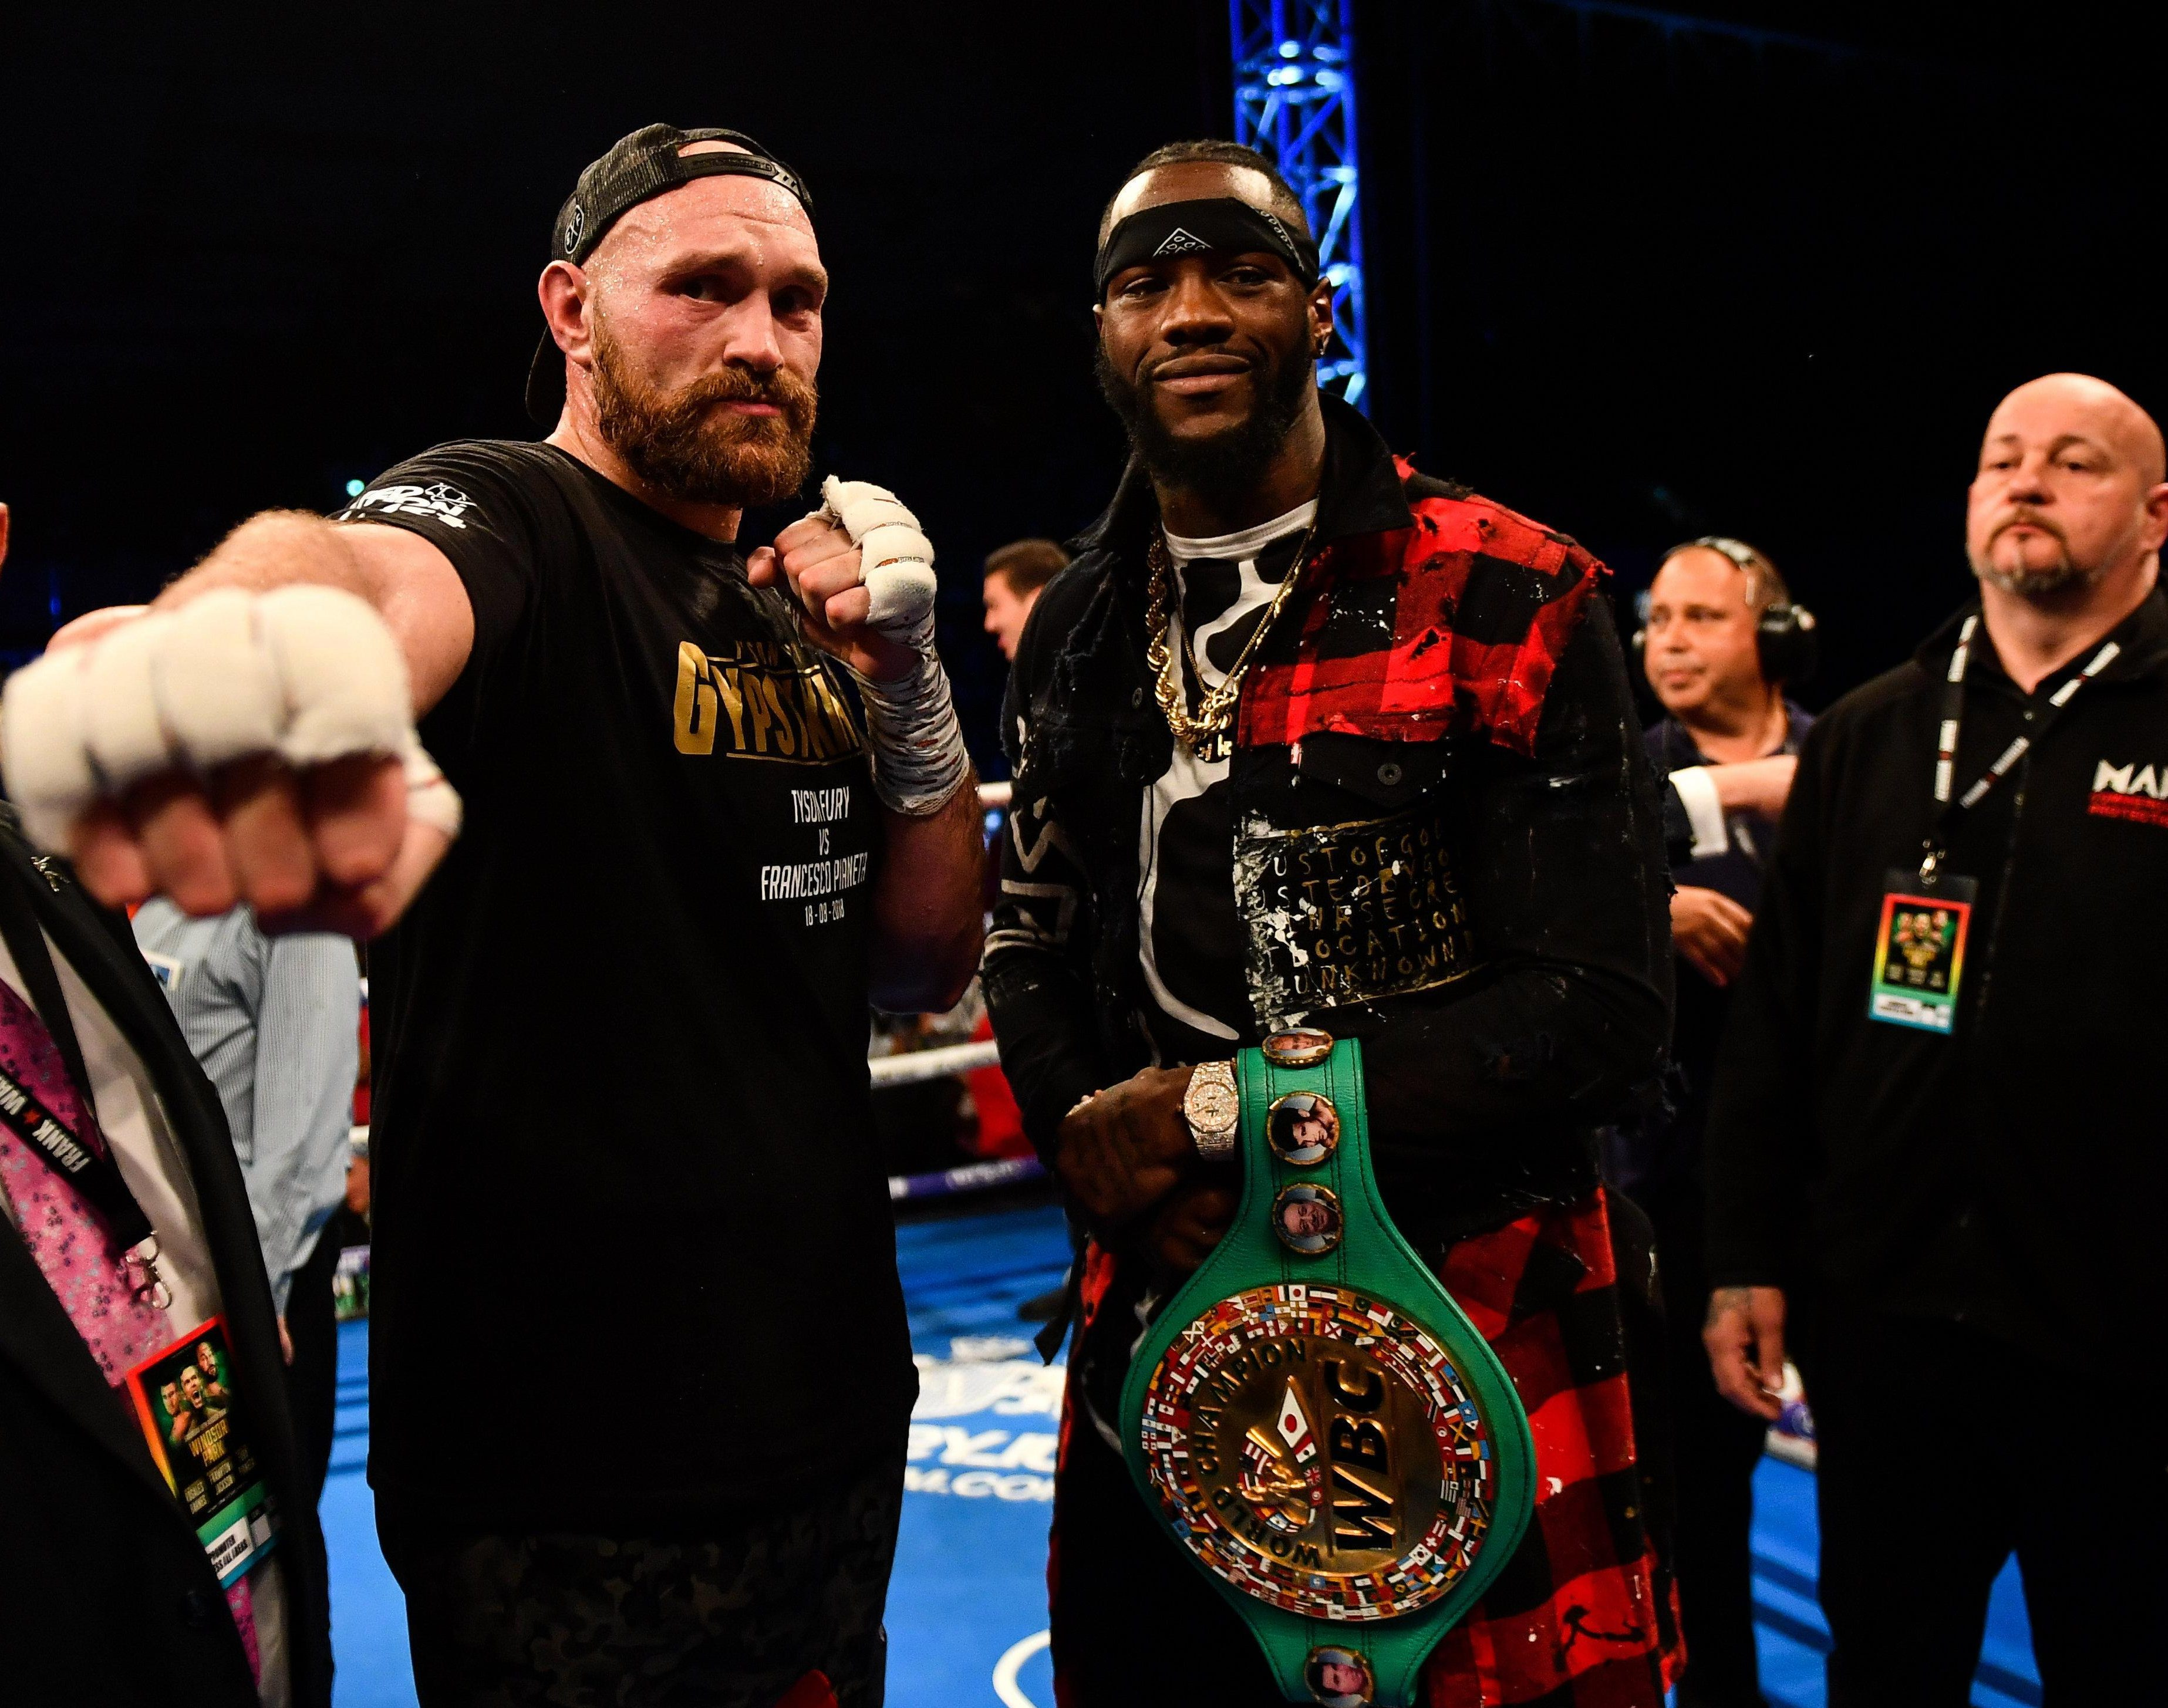 Lennox Lewis says AJ should fight Tyson Fury or Deontay Wilder